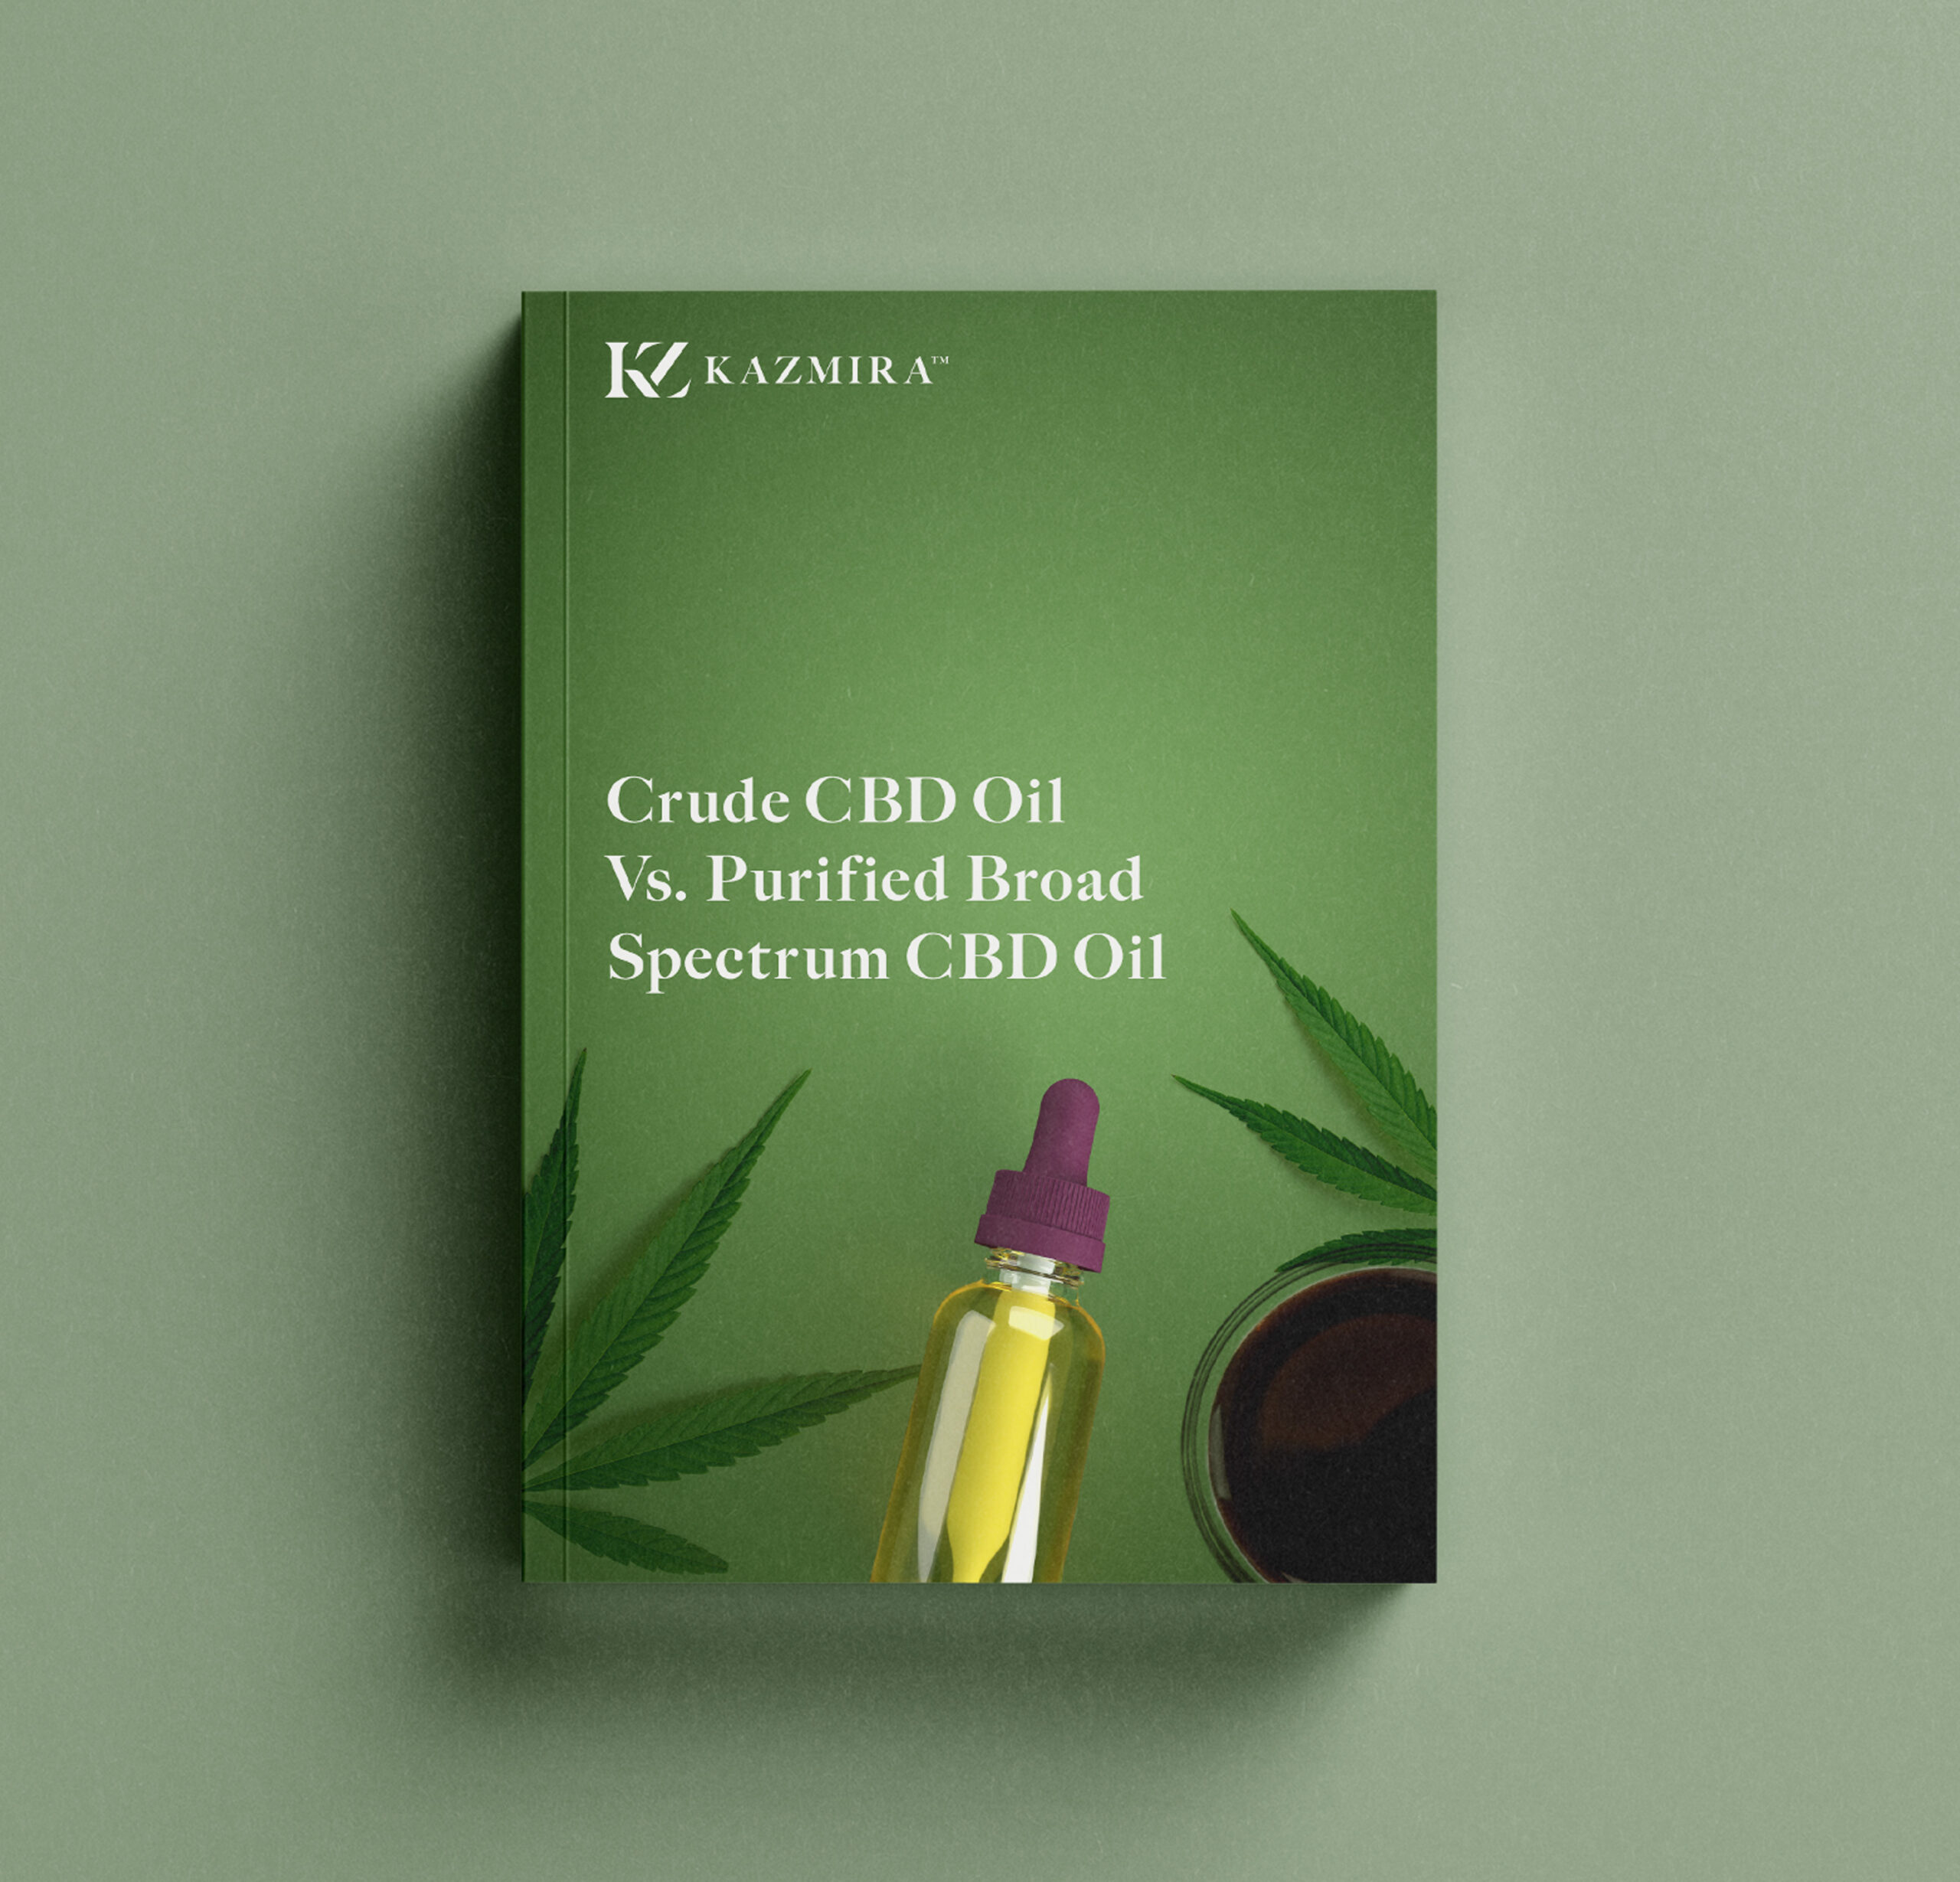 White Paper: Crude CBD Oil vs. Purified Broad Spectrum CBD Oil